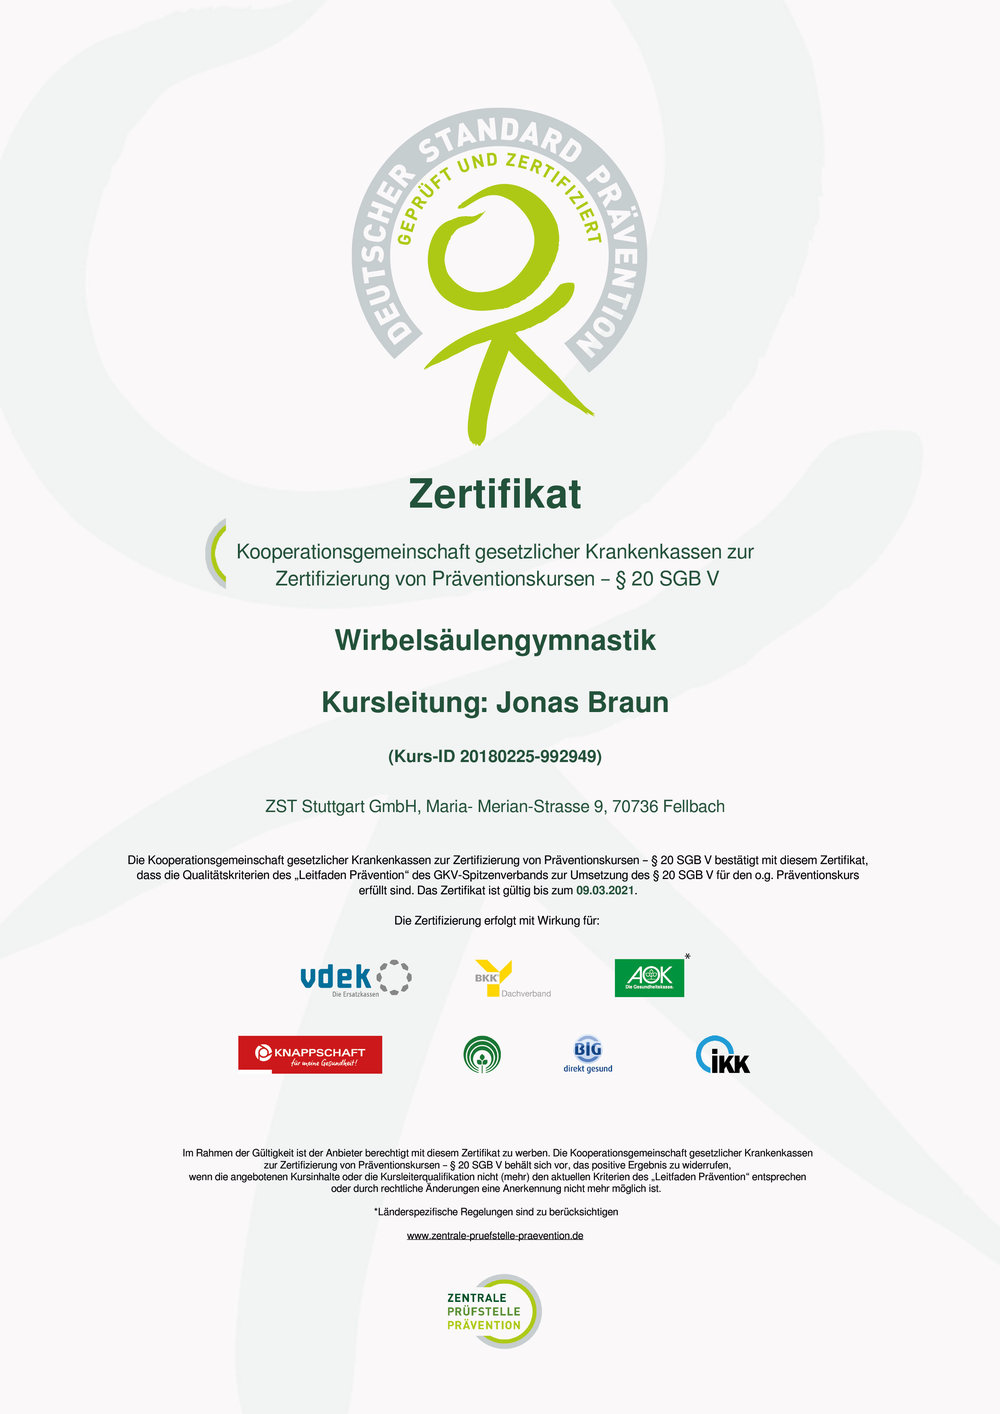 zertifikat_20180225-992949-1.jpg